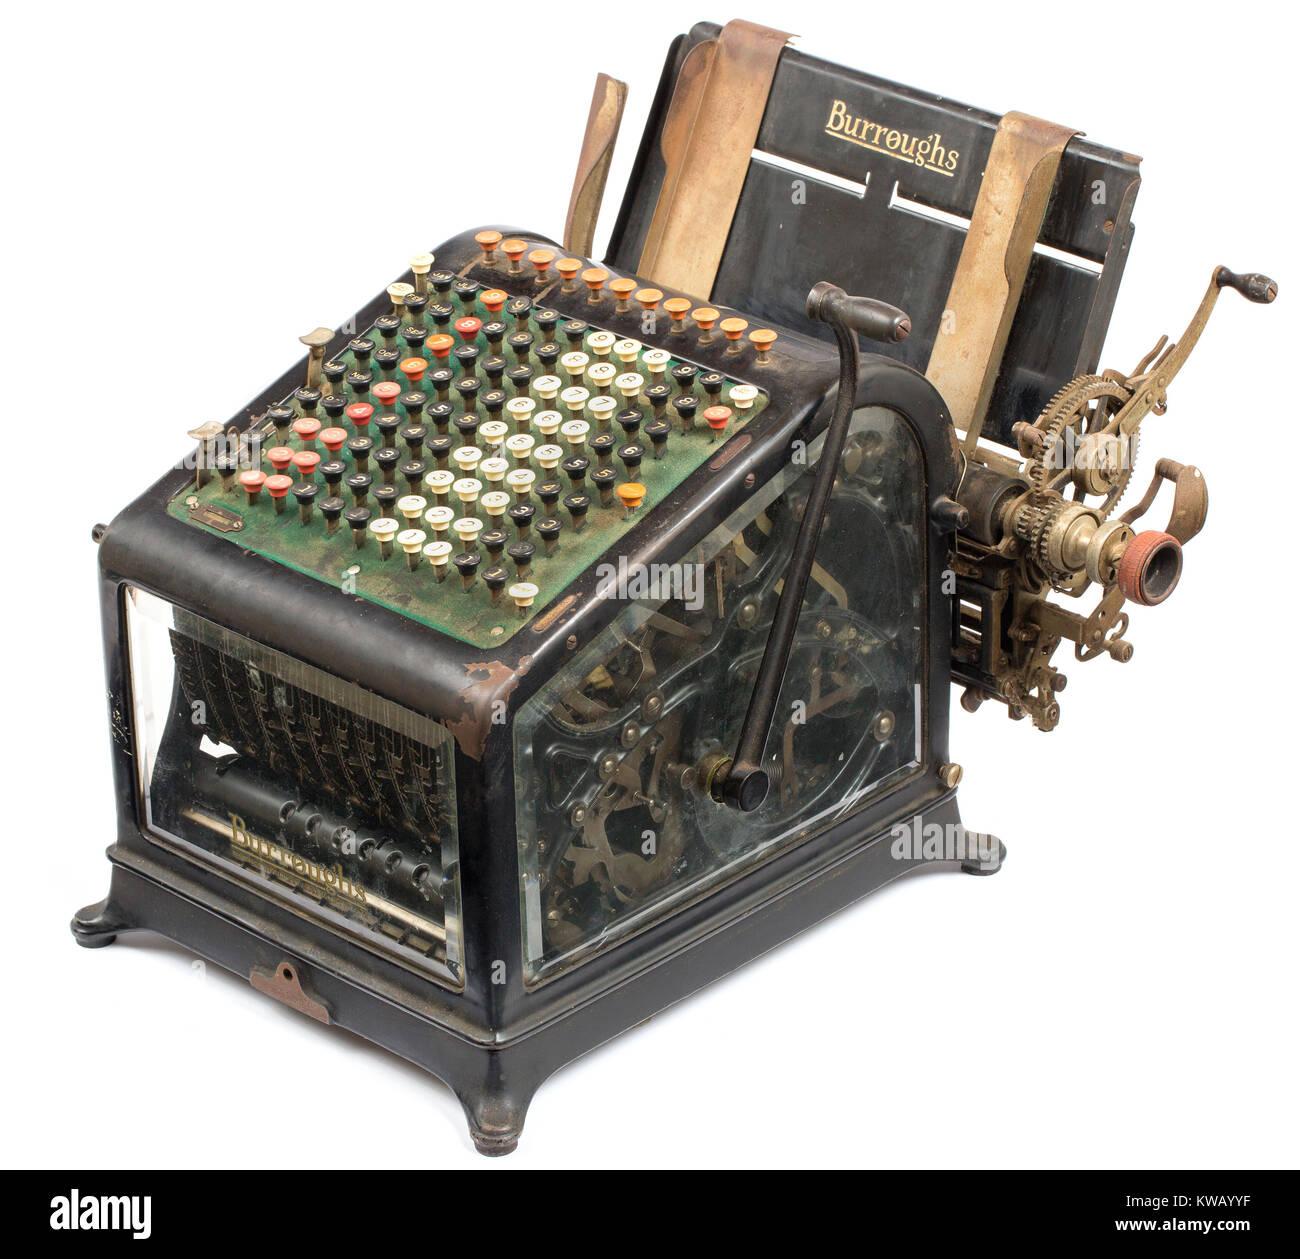 Early 20th century Burroughs adding machine ca: 1911-1913 - Stock Image